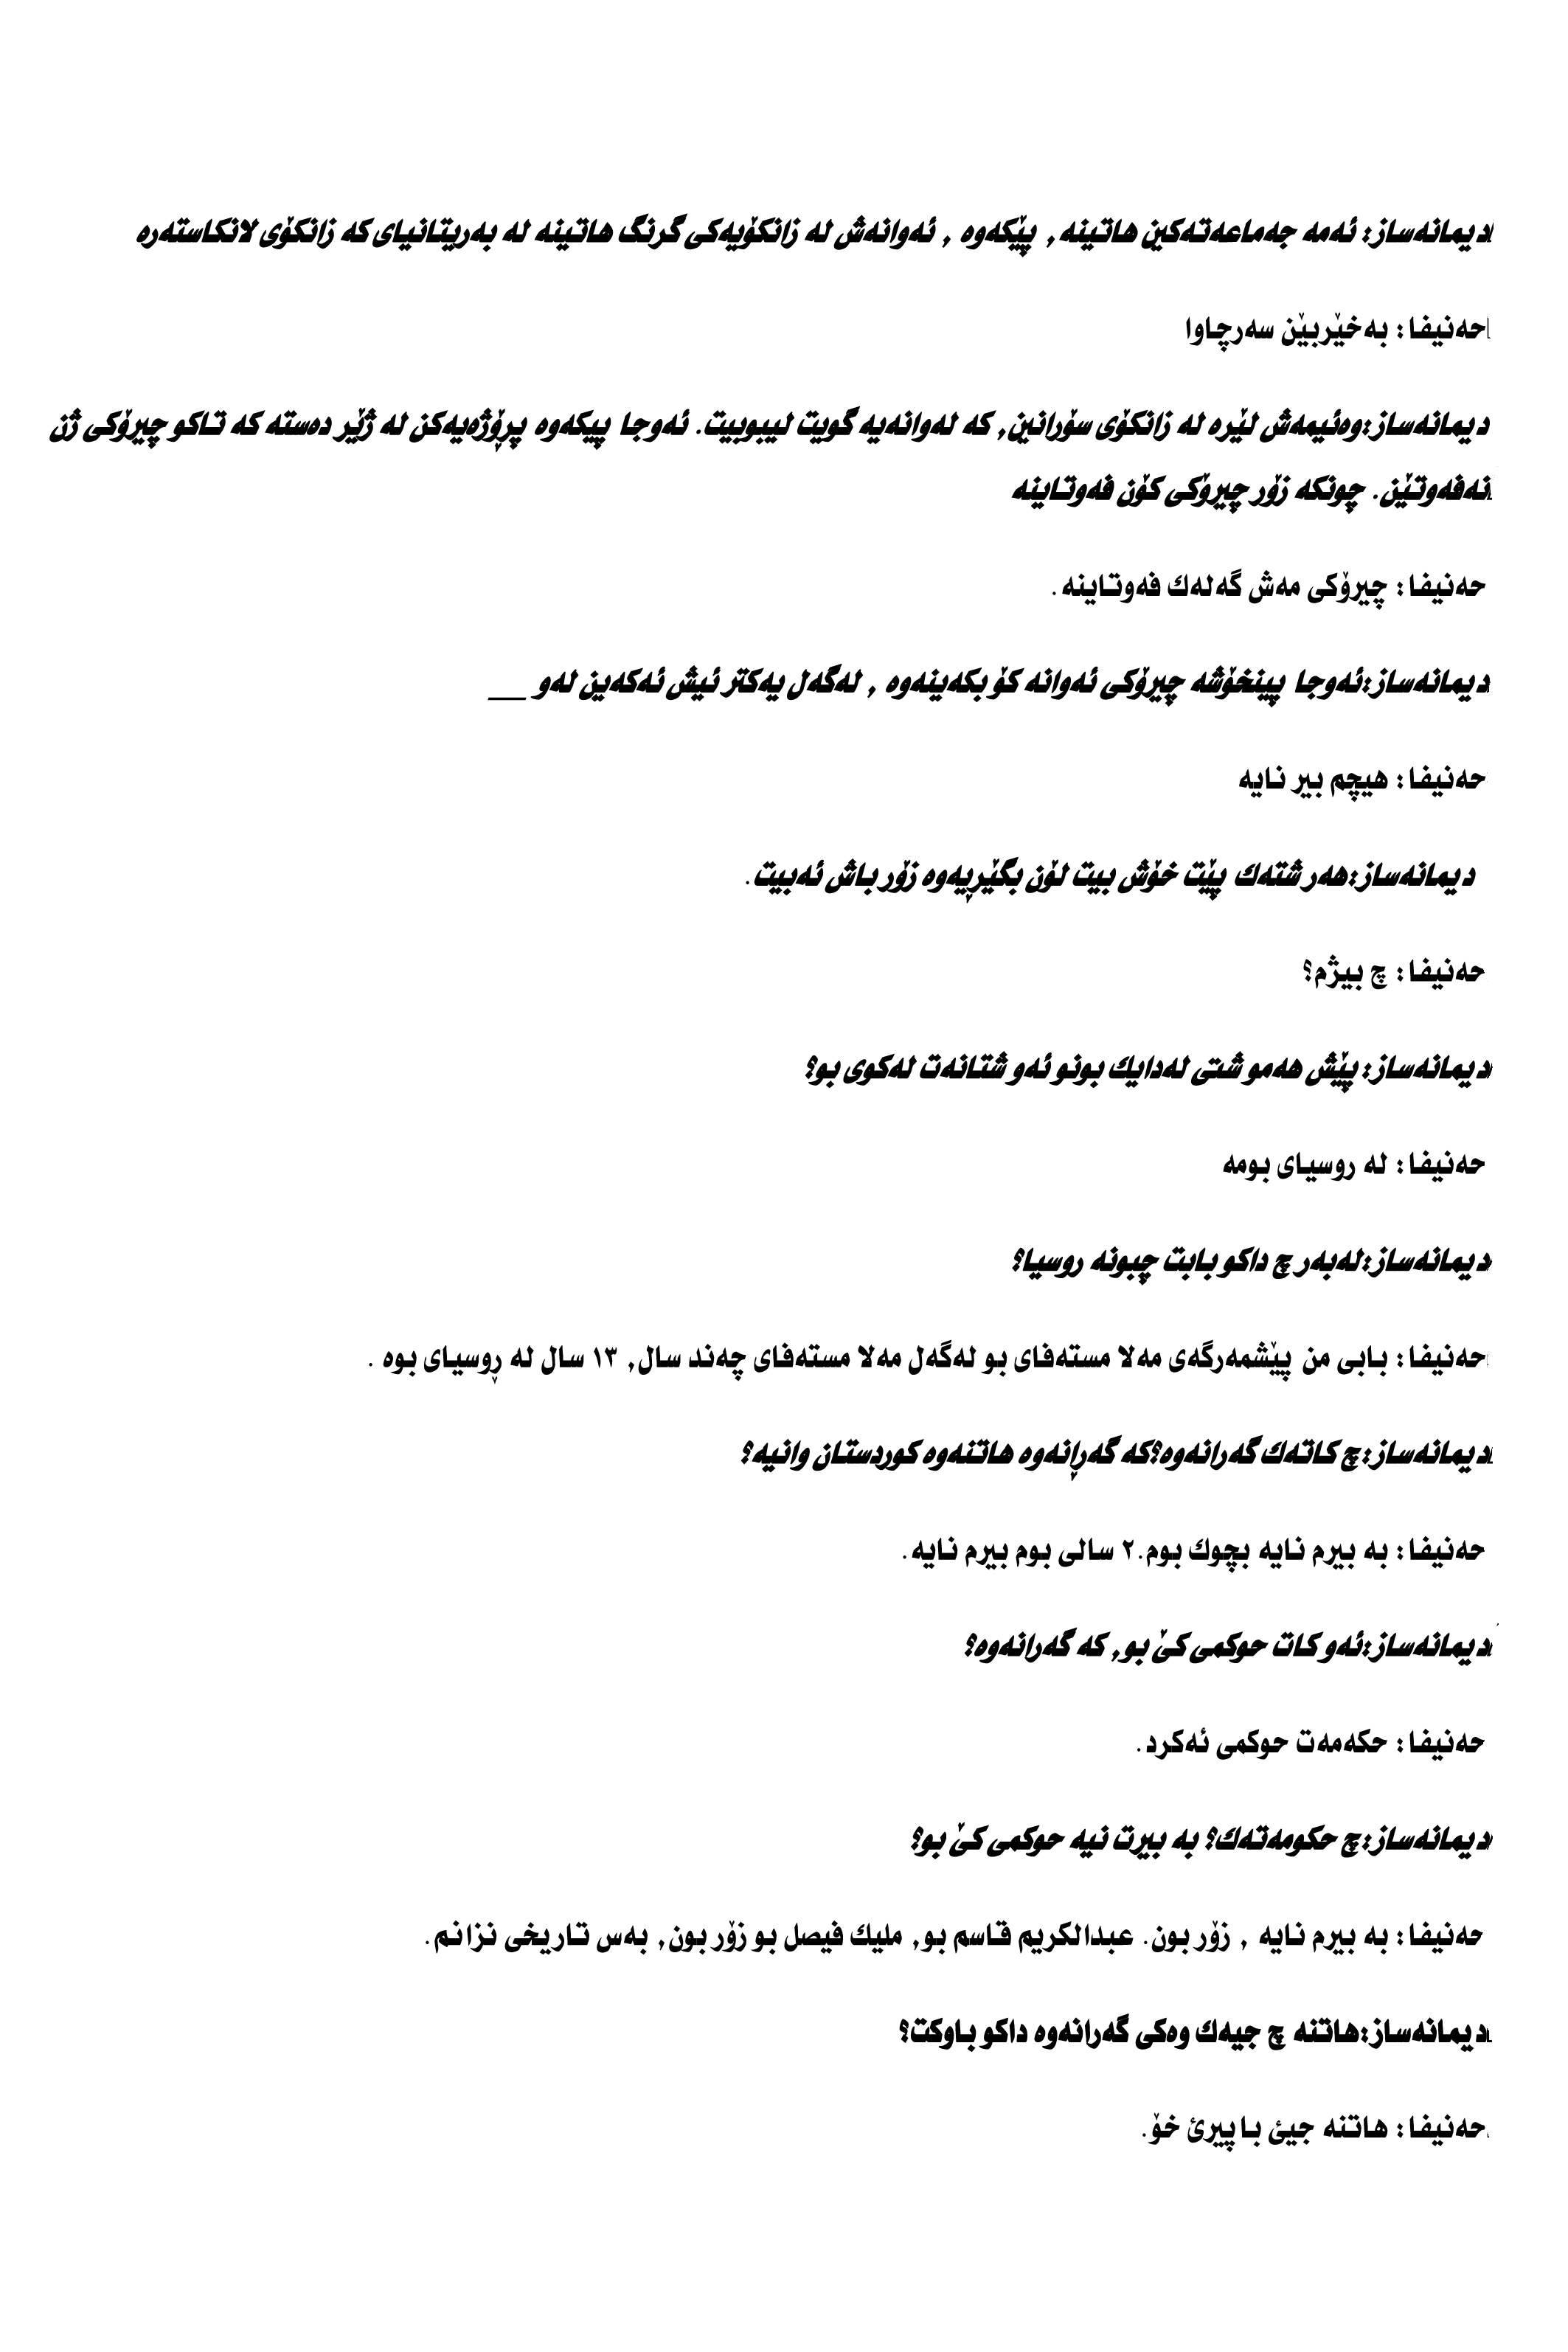 Hanifa1